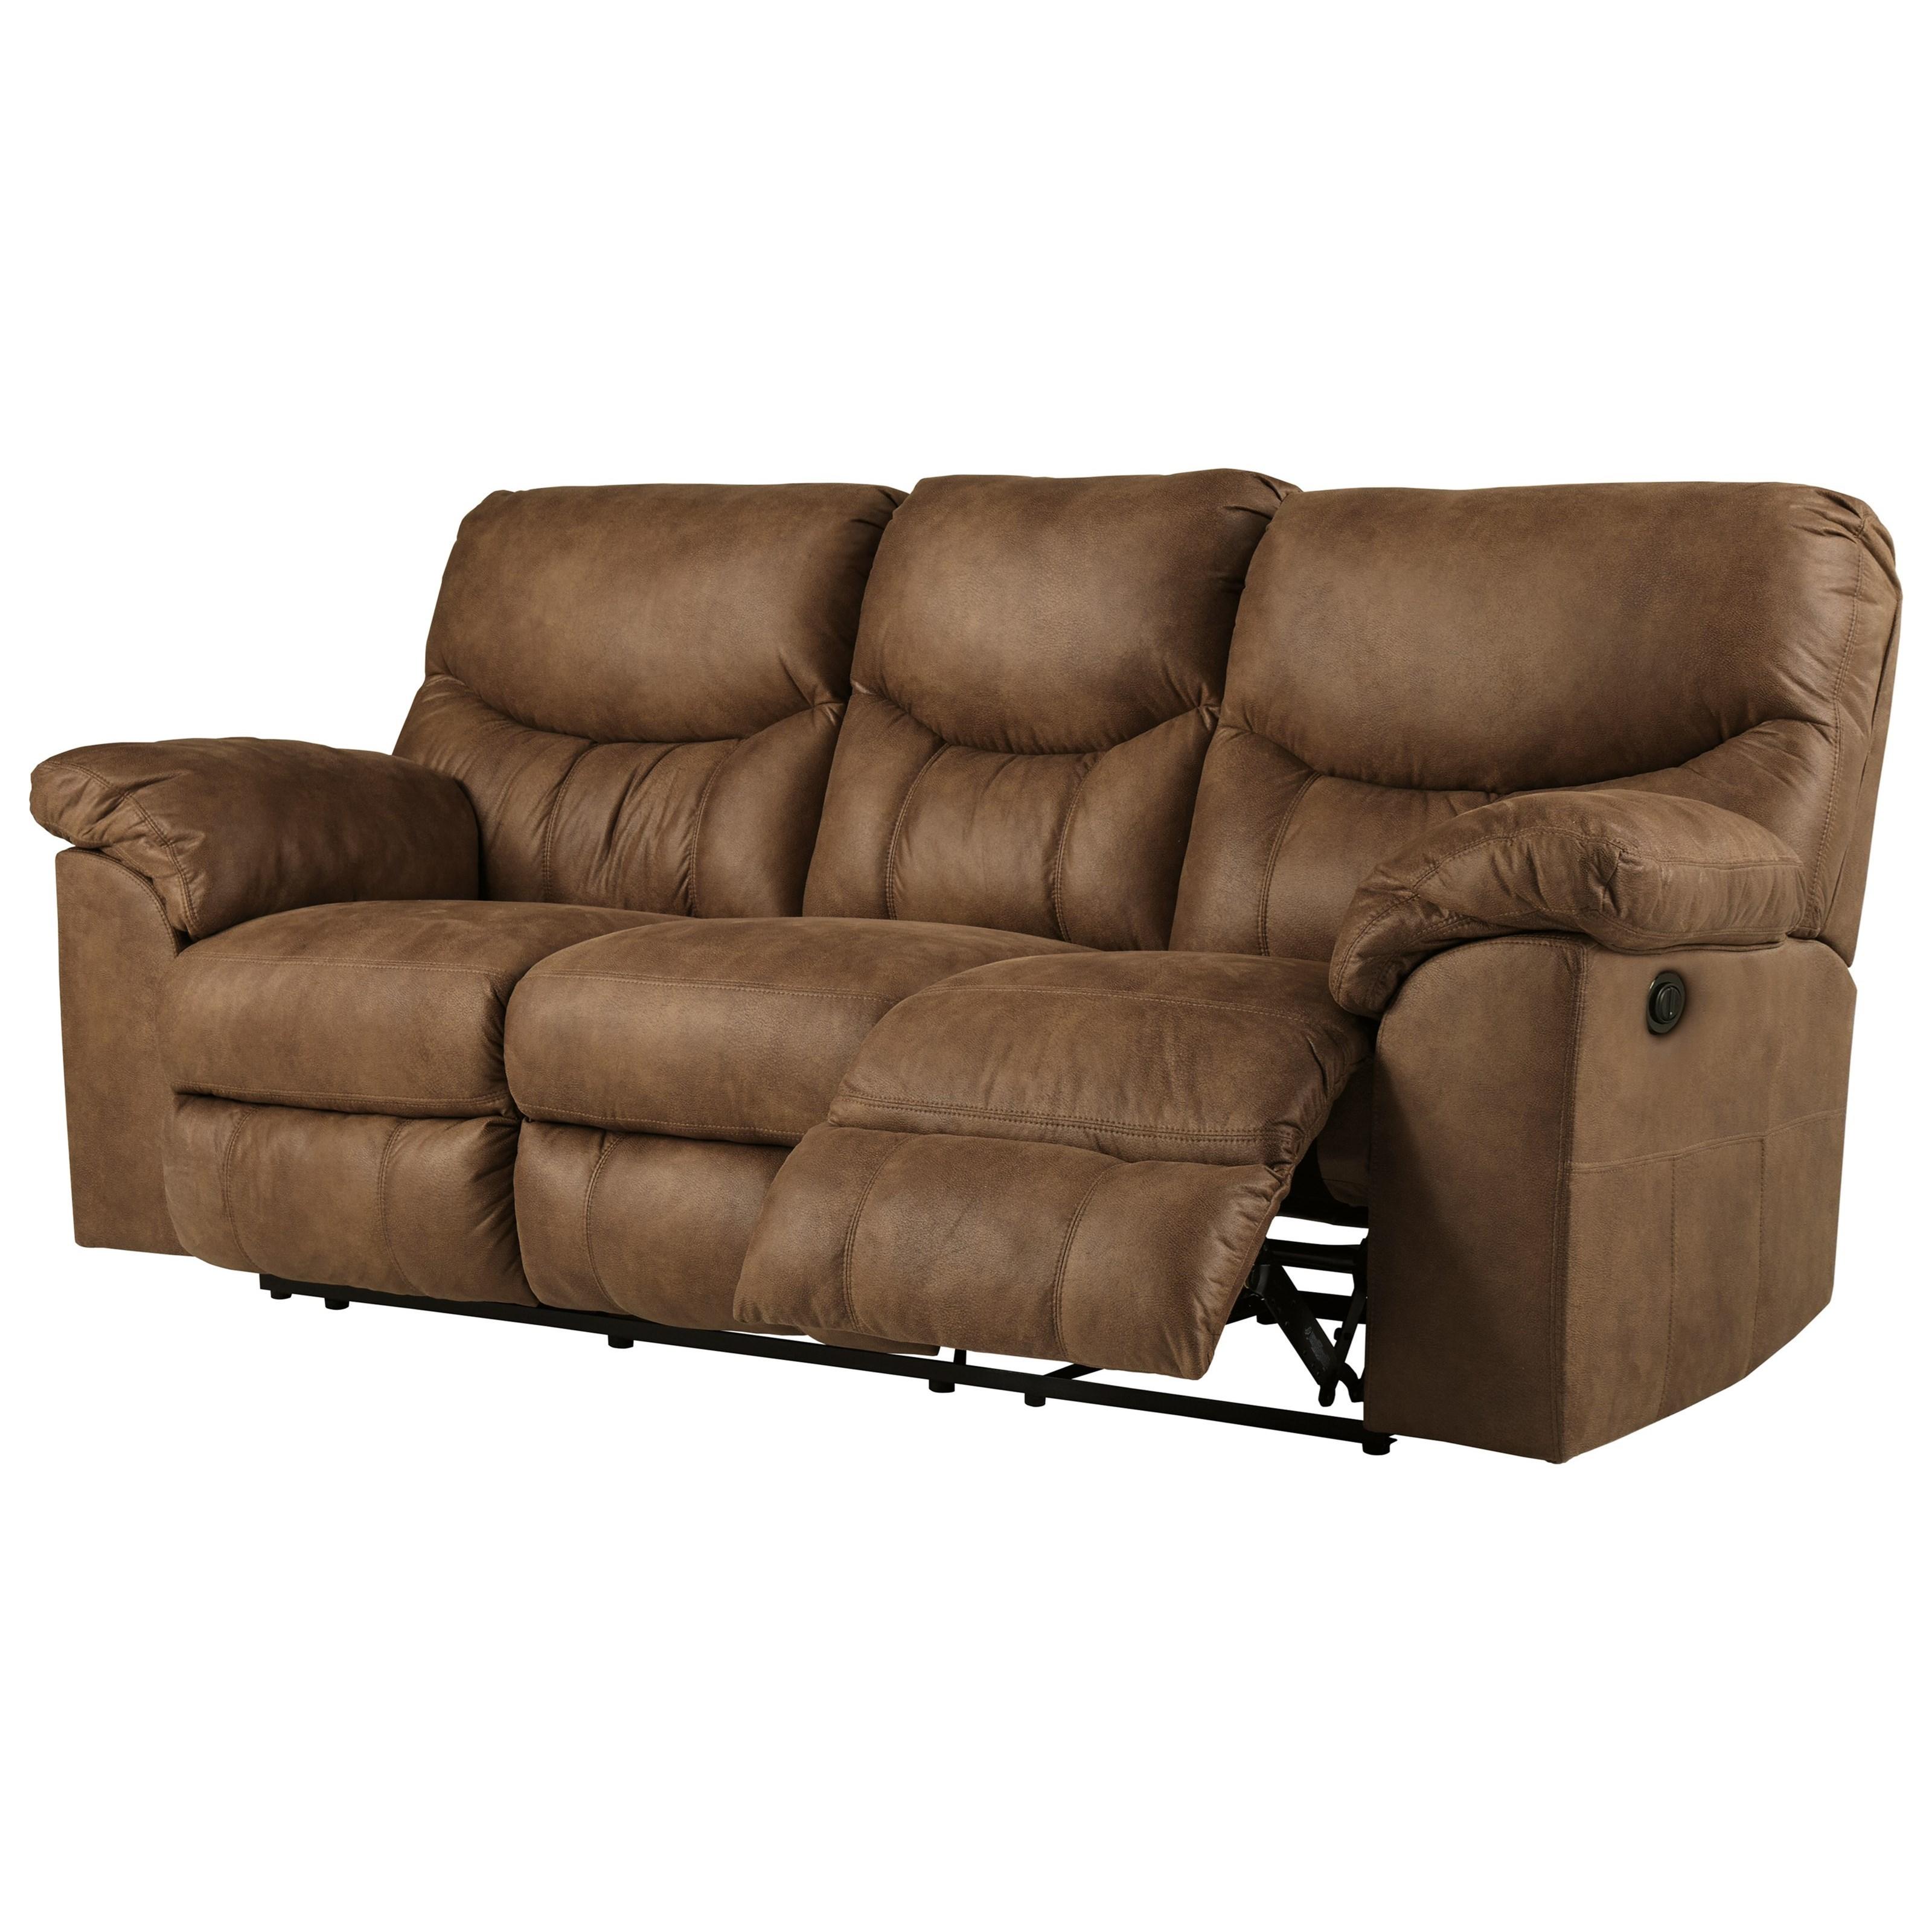 Levitz Furniture Store Locations: Signature Design By Ashley Boxberg 3380288 Casual